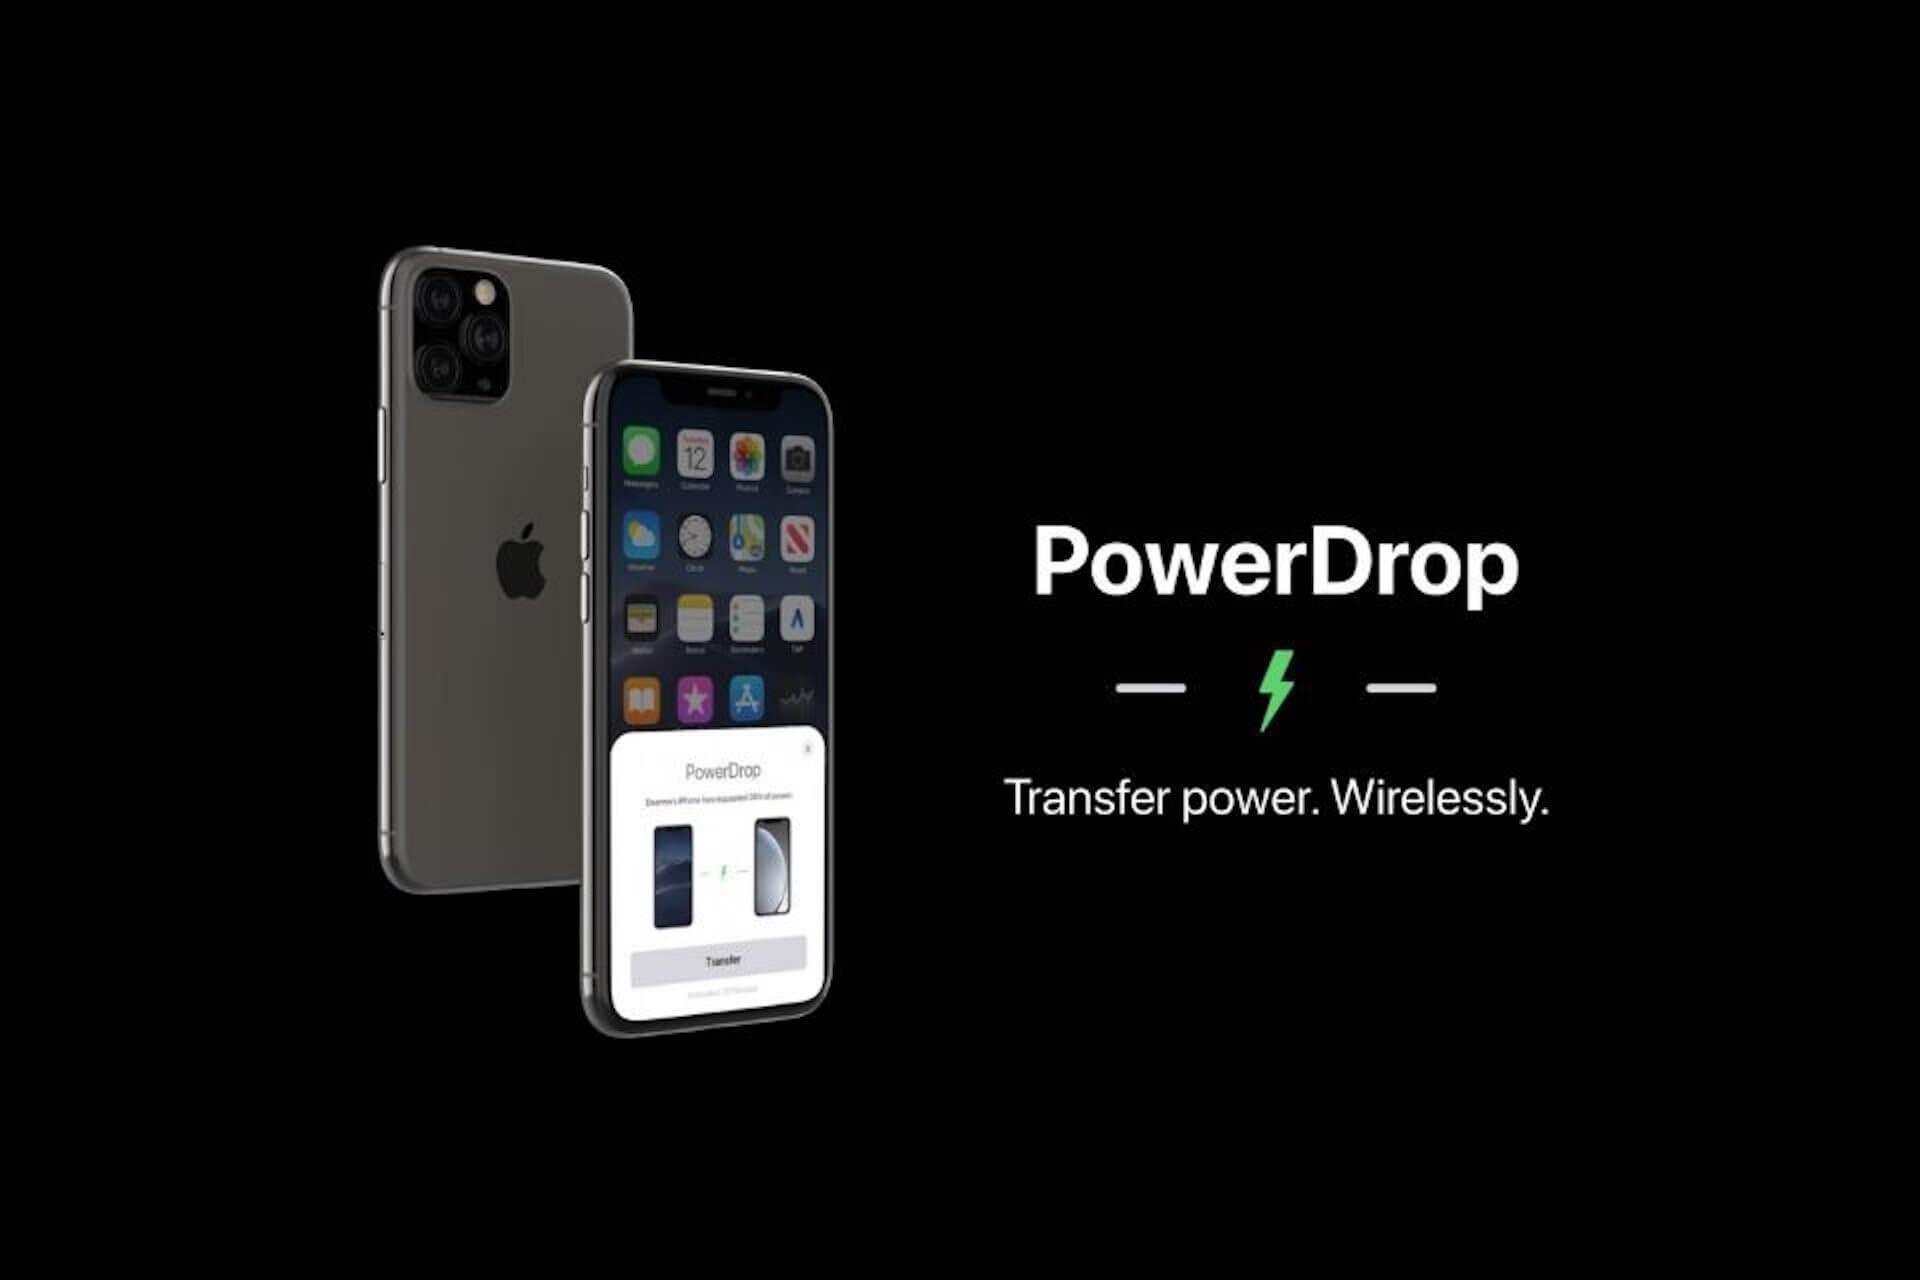 iPhone同士で充電できる!?新機能「PowerDrop」のコンセプト画像が公開 tech200127_apple_powerdrop_main